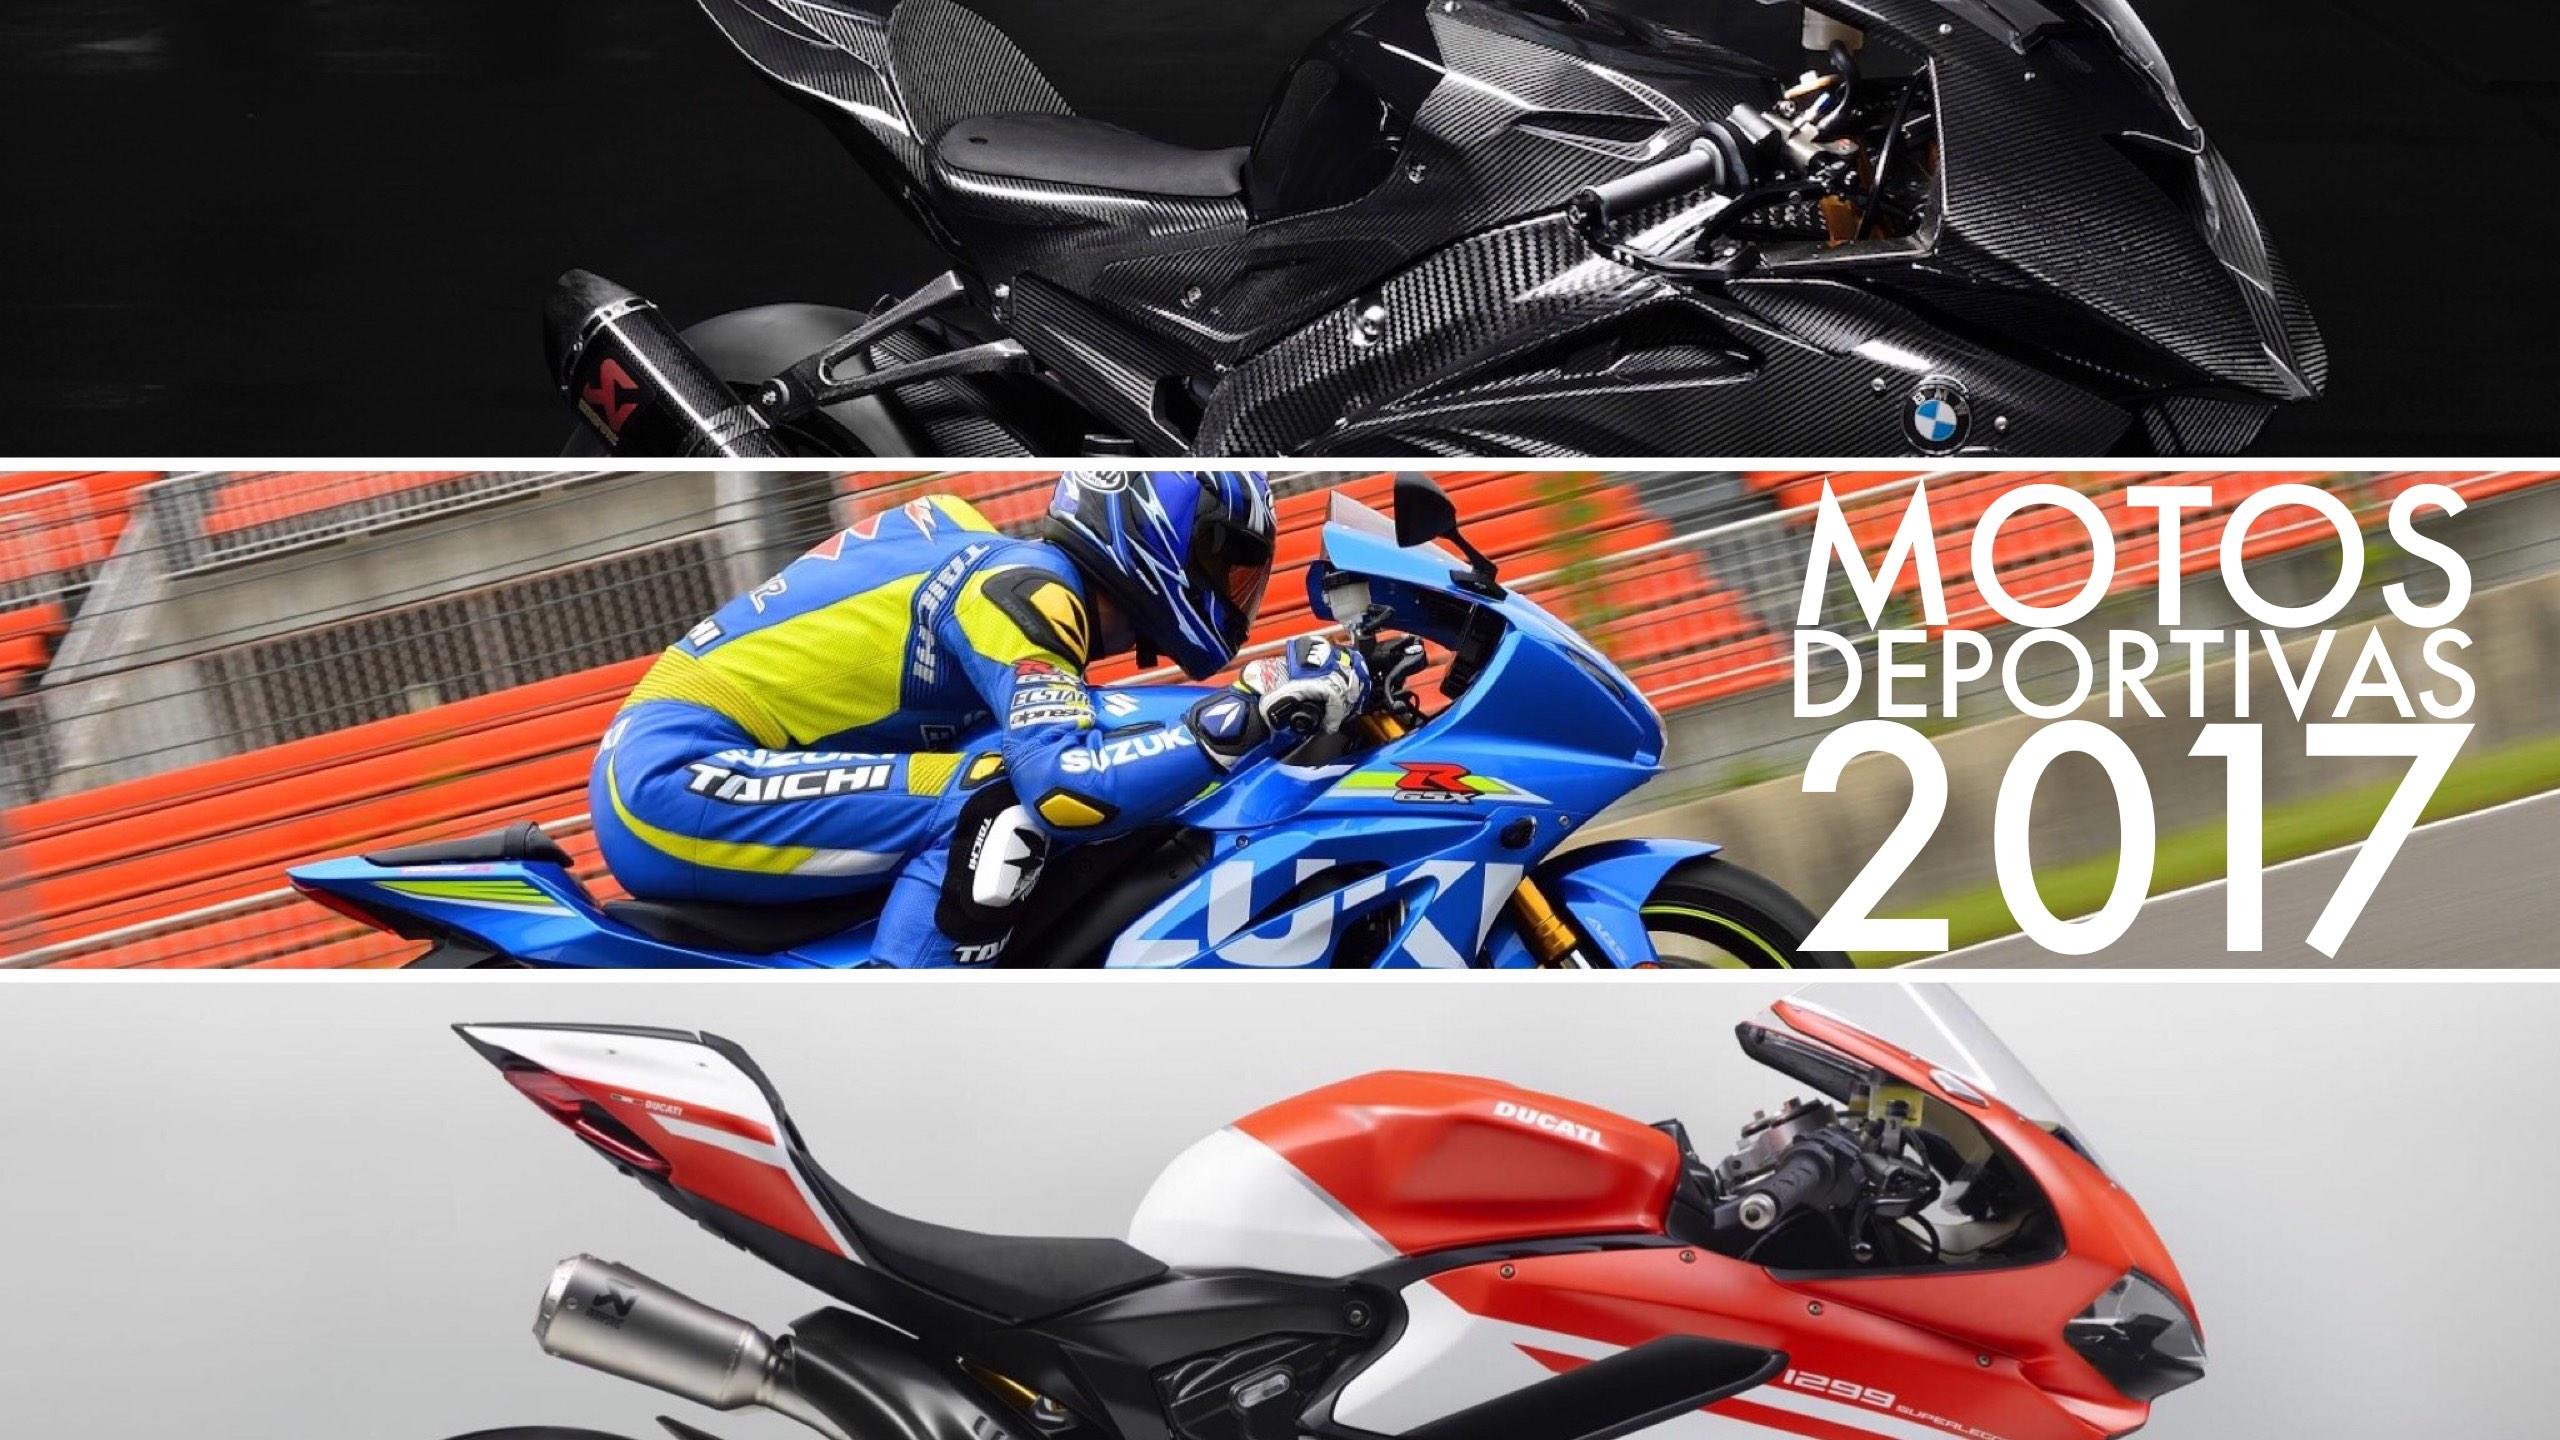 Novedades Motos Deportivas 2017